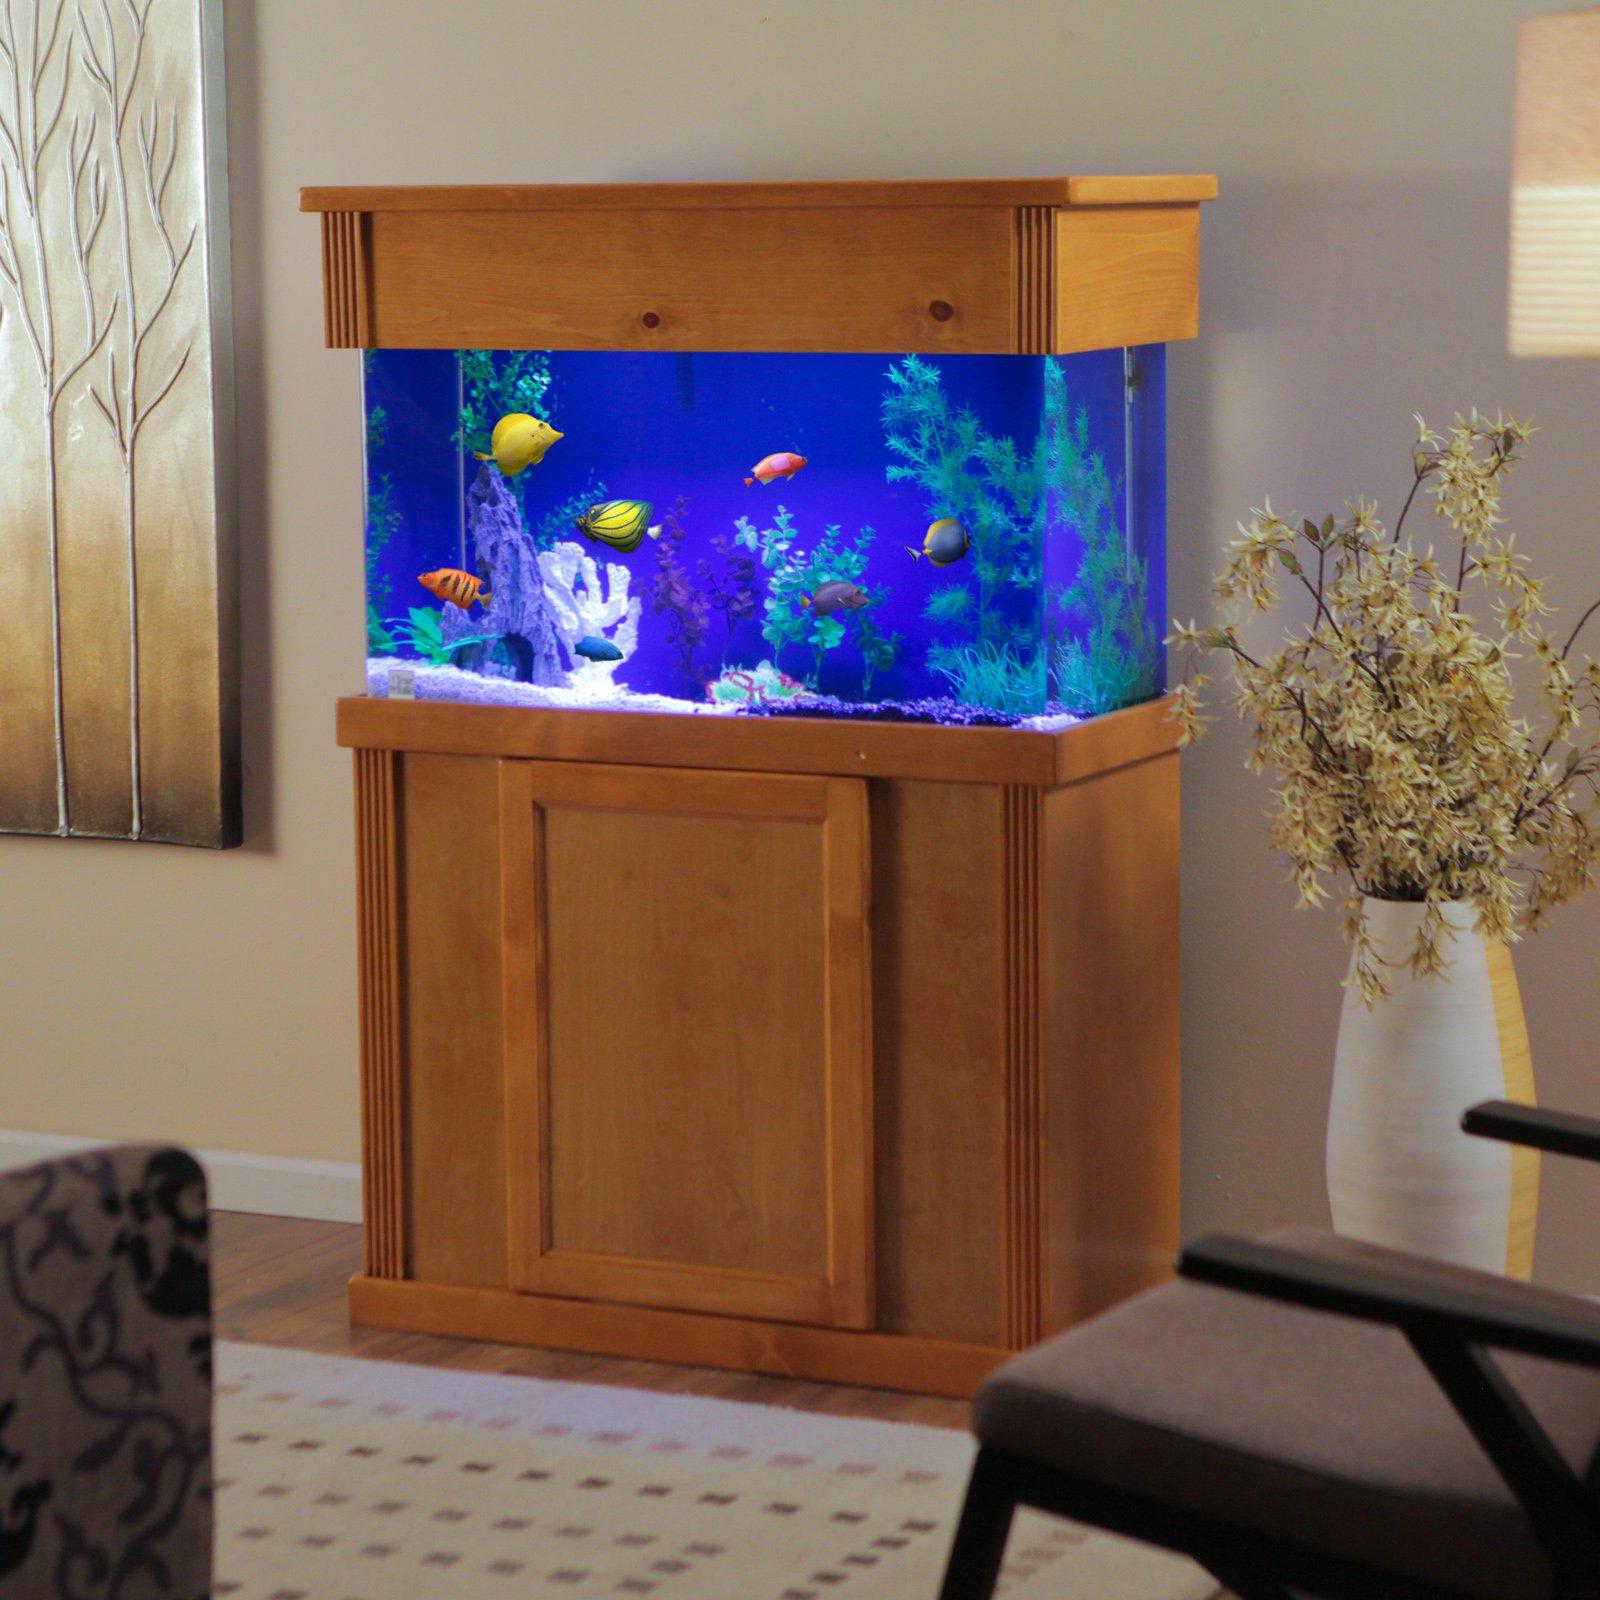 Advance Aqua Laguna Series Rectangular Wood Aquarium Stan...